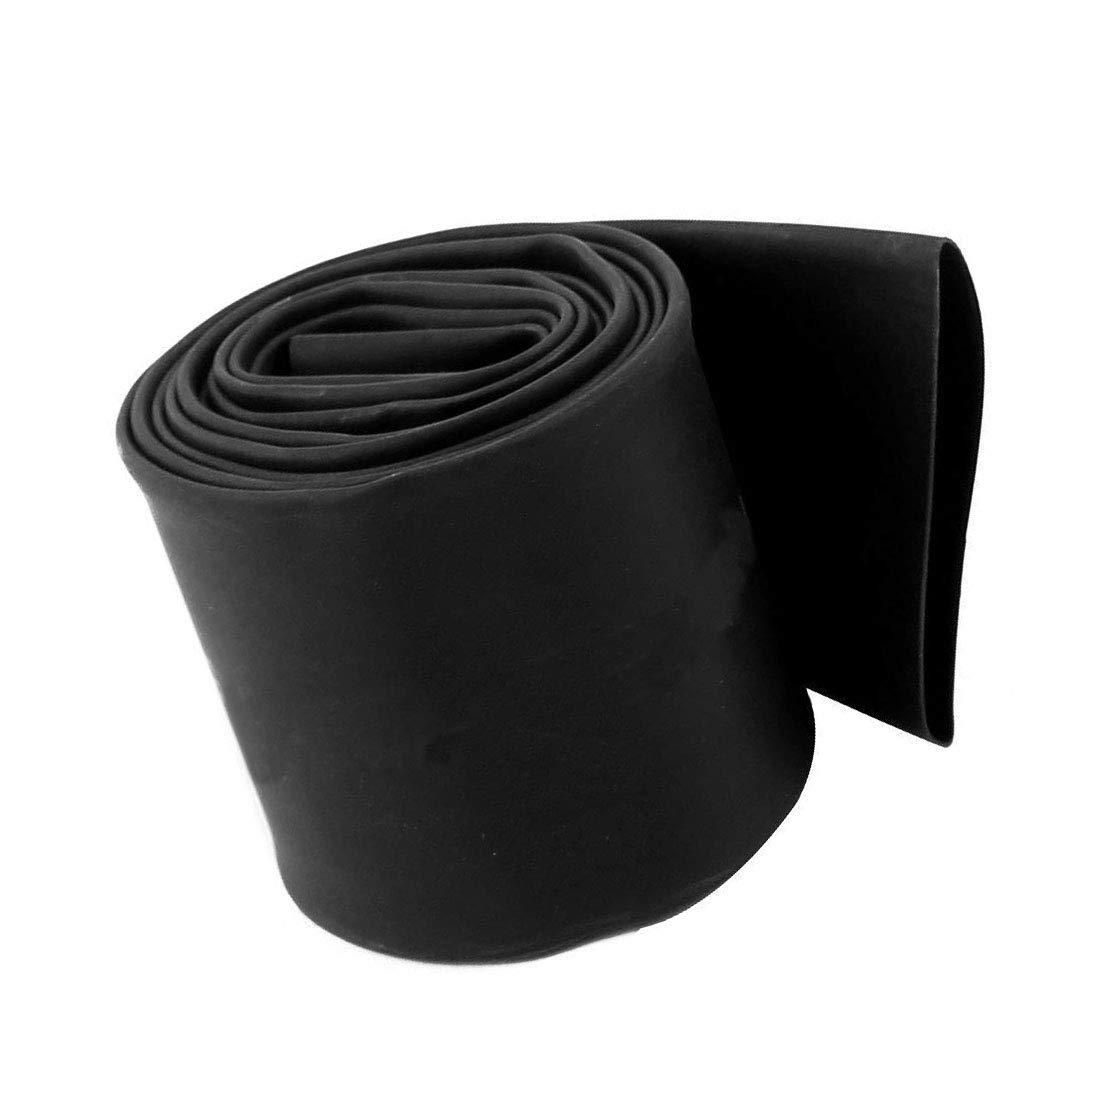 Aodesy Heat Shrink Tubing 2:1 Ratio 1.6inch Diameter Heat Activated Adhesive Matine Shrink Tube Wire Sleeving Wrap Protector 7M 22.97Ft Shenzhenshiaodesiwujinjidianyouxiangongsi